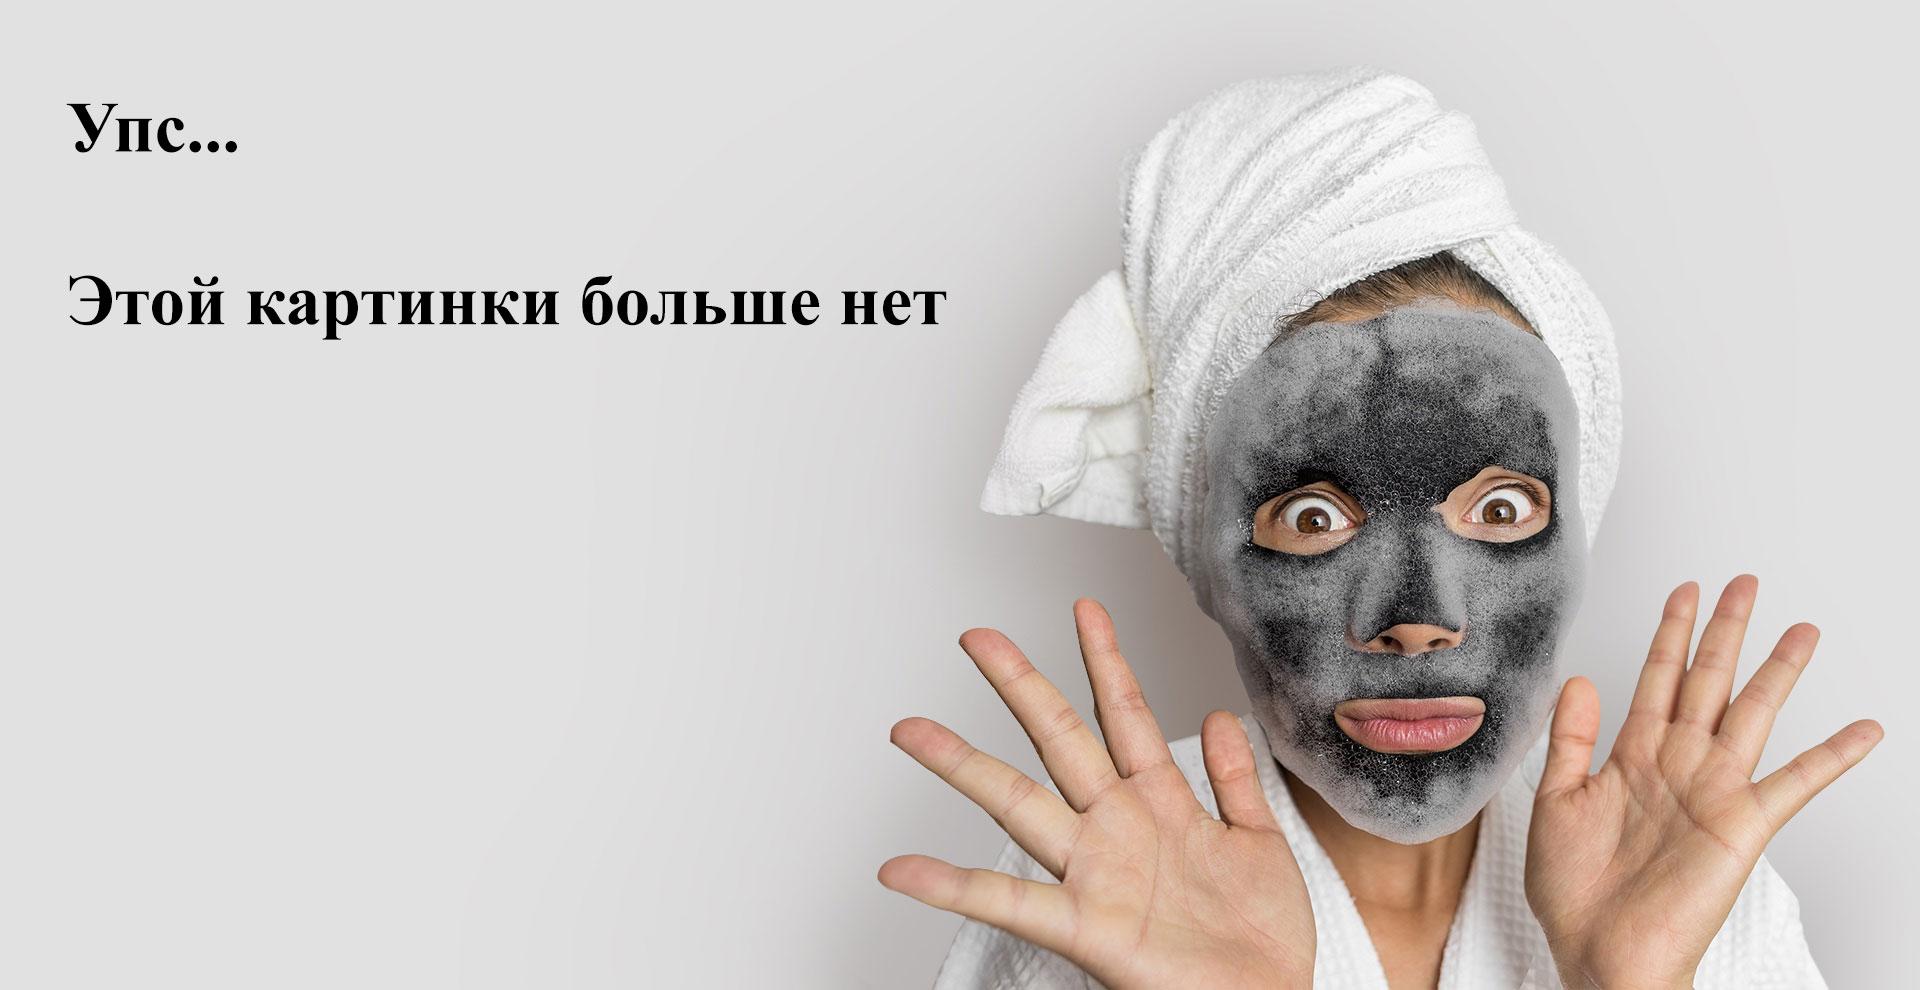 Patrisa Nail, Гель-лак Московская сага №744